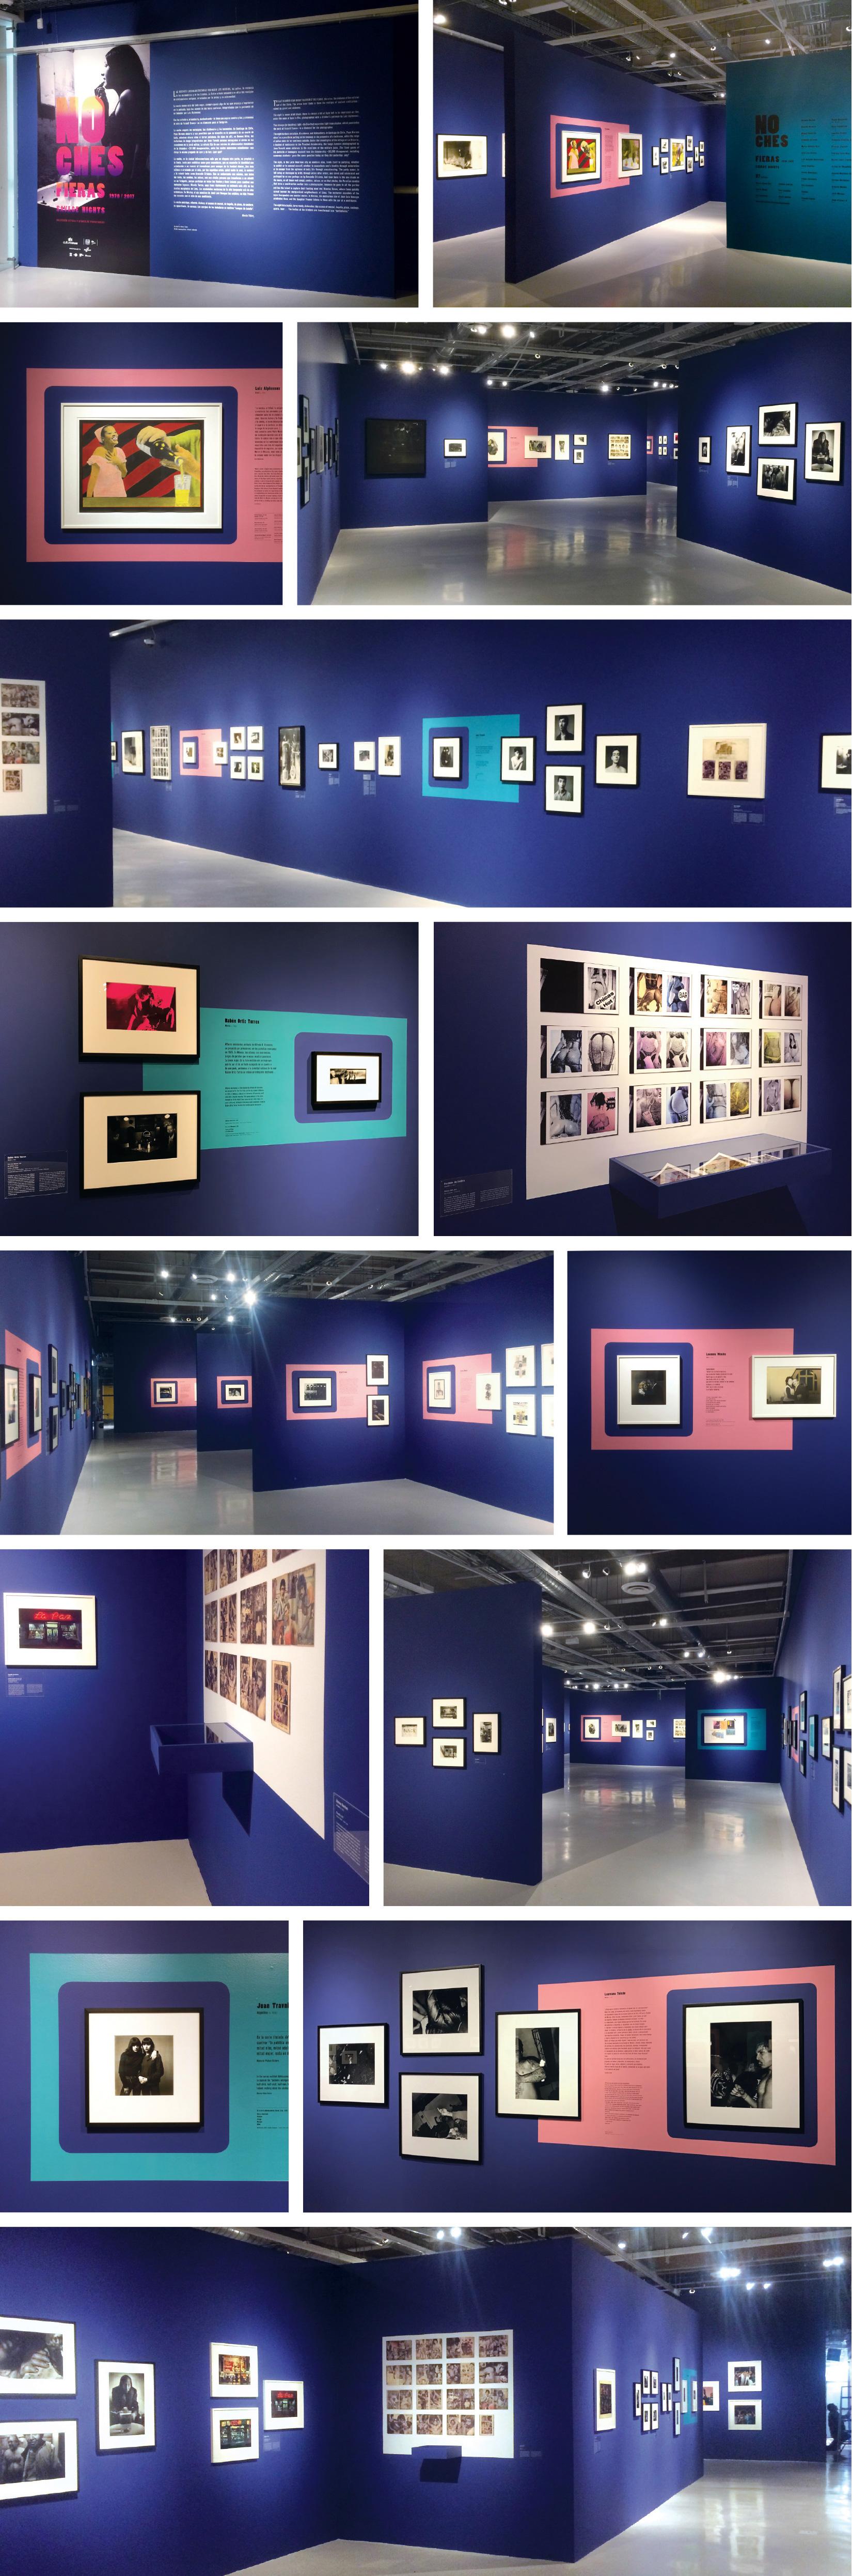 noches-fieras-toluca-studio-olivier-andreotti-expo4.jpg